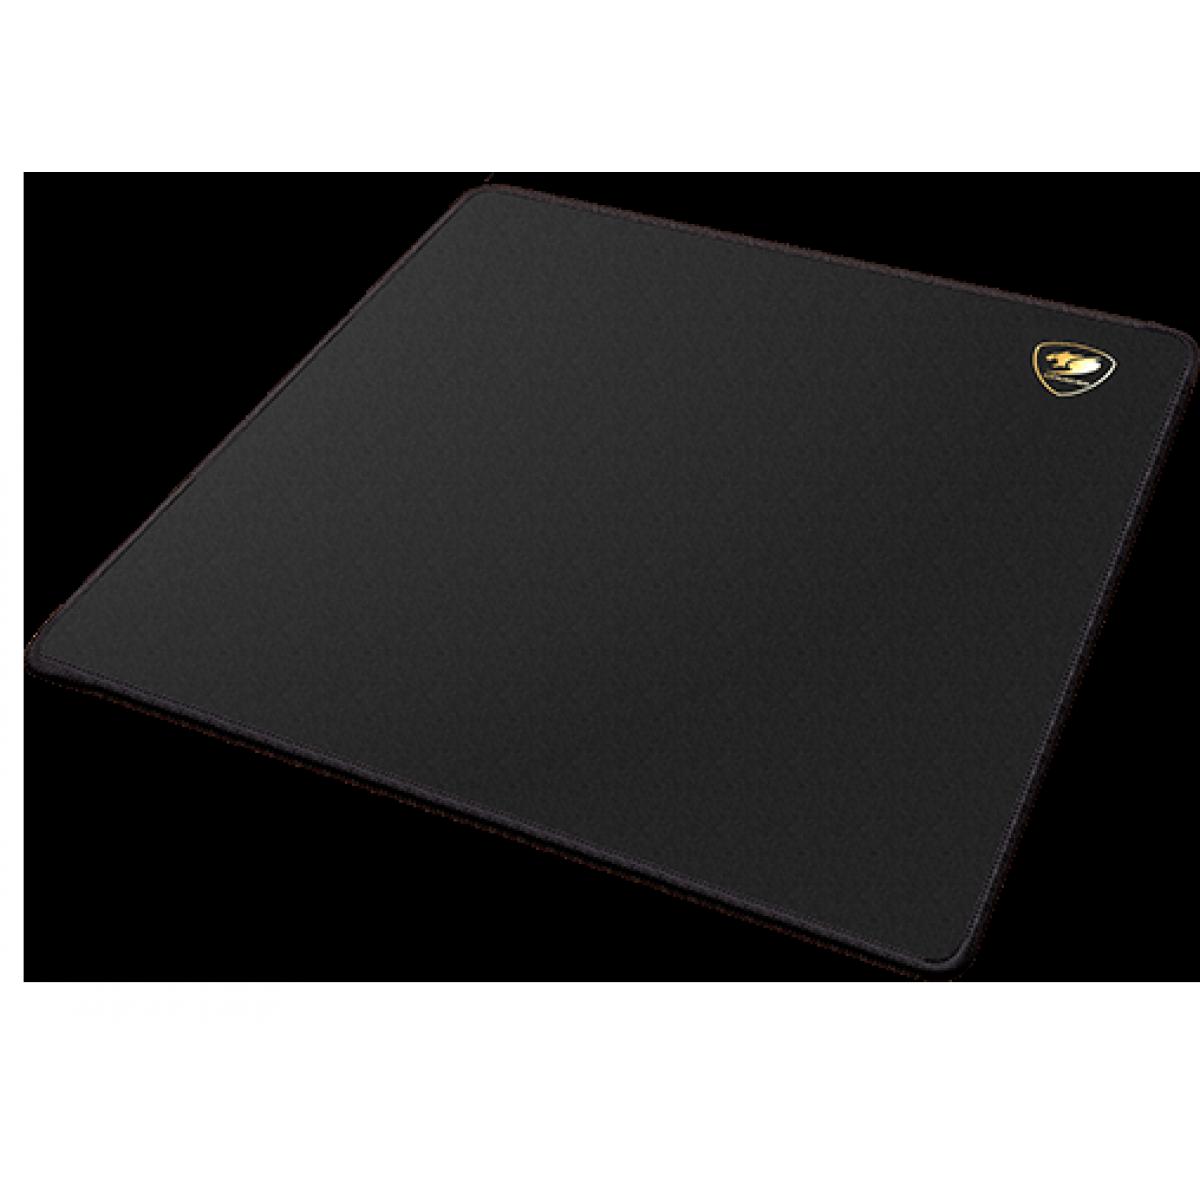 Mousepad Gamer Cougar Control EX Medium